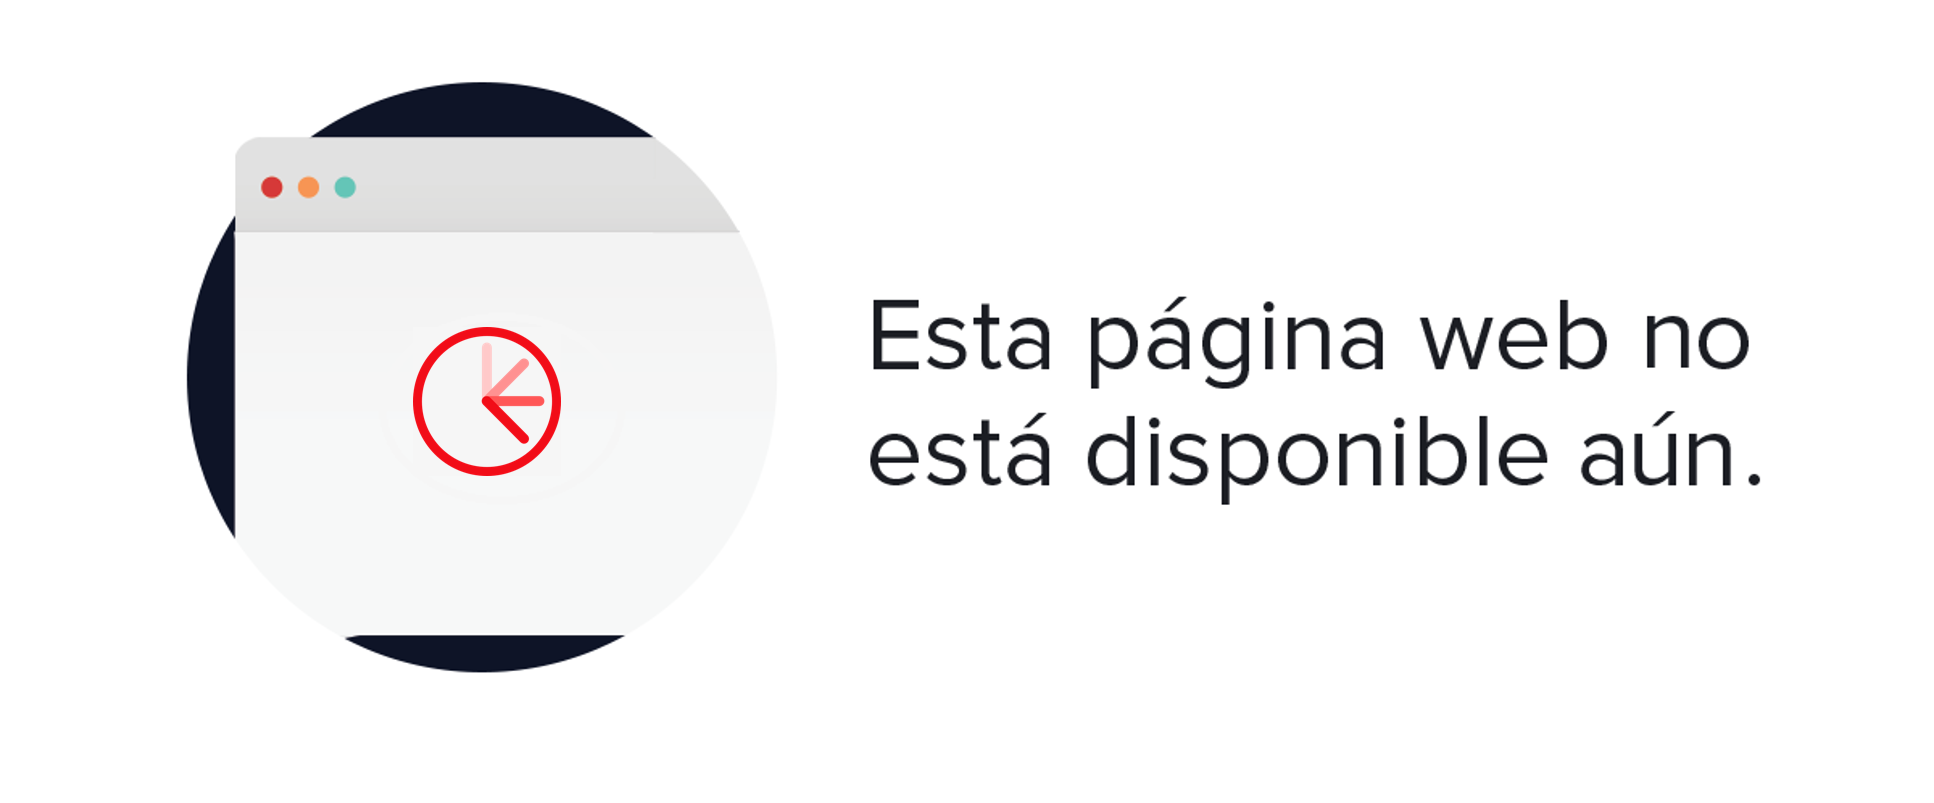 65f30fea136 Polo Ralph Lauren - Falda midi de mujer Polo Ralph Lauren realizada en piel Marrón  claro 001014962292265002 - BSKRXGN